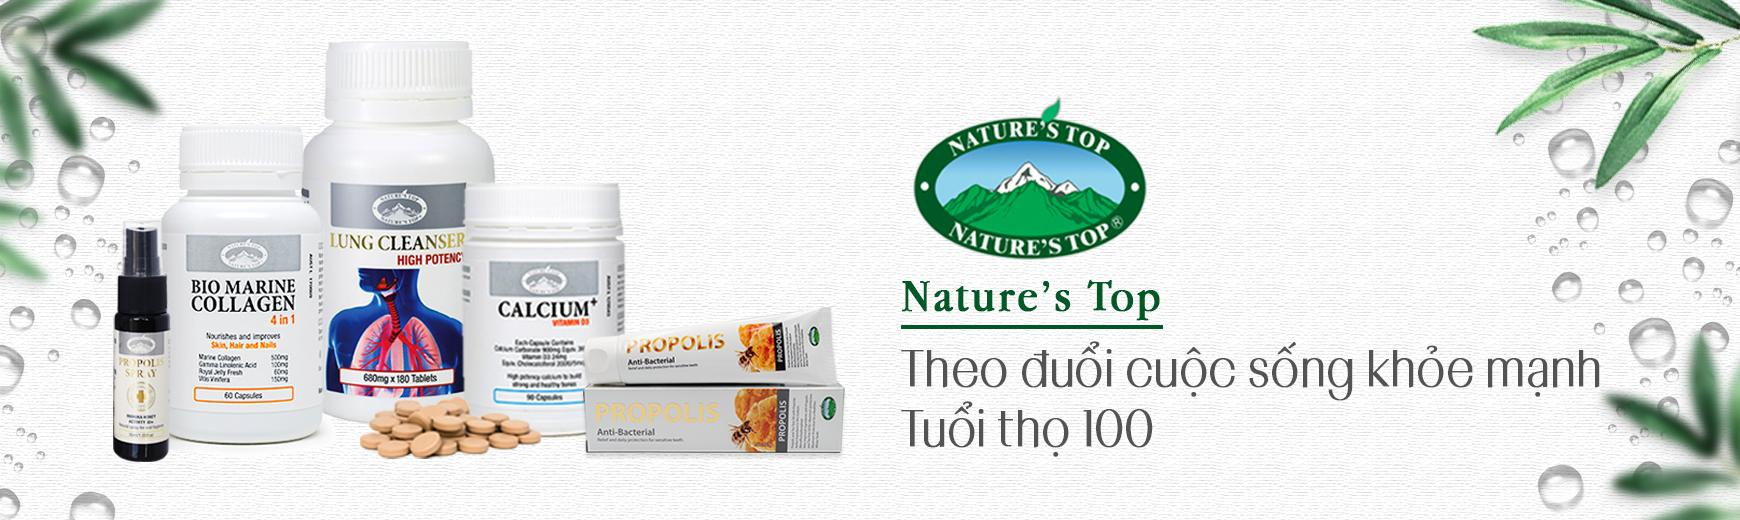 Natures Top Viet Nam